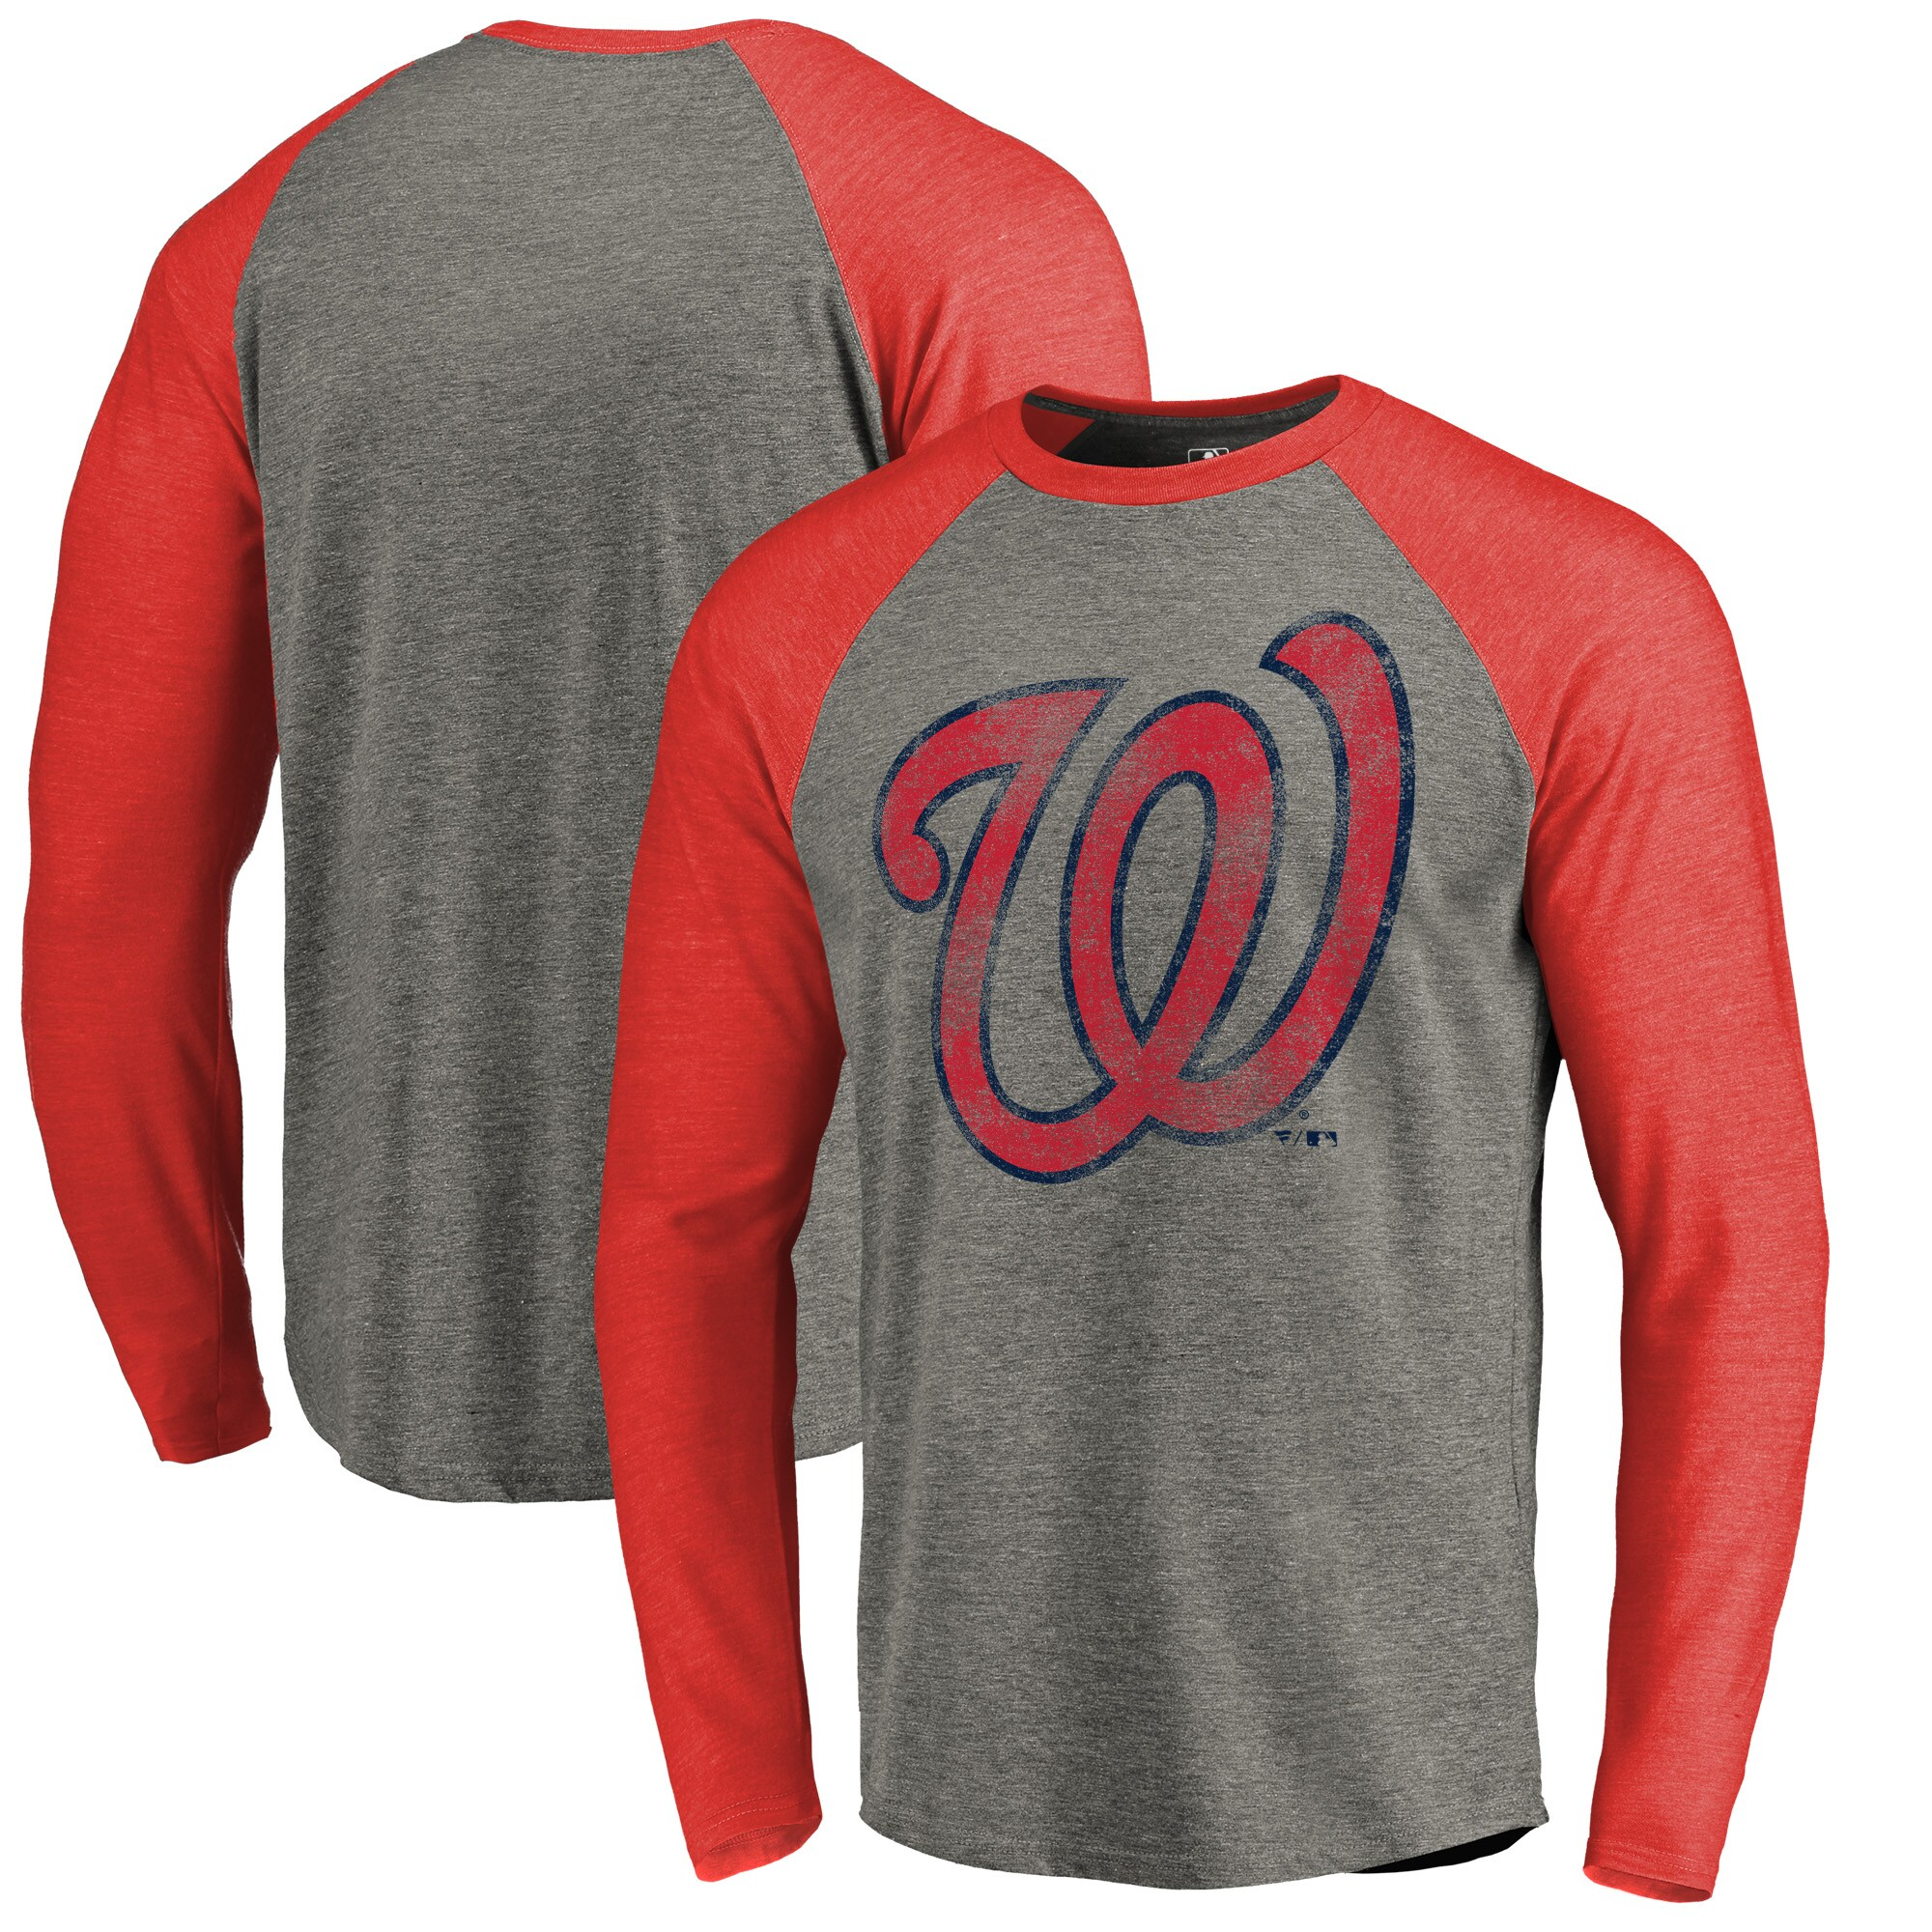 Washington Nationals Fanatics Branded Distressed Team Big & Tall Long Sleeve Tri-Blend Raglan T-Shirt - Gray/Red